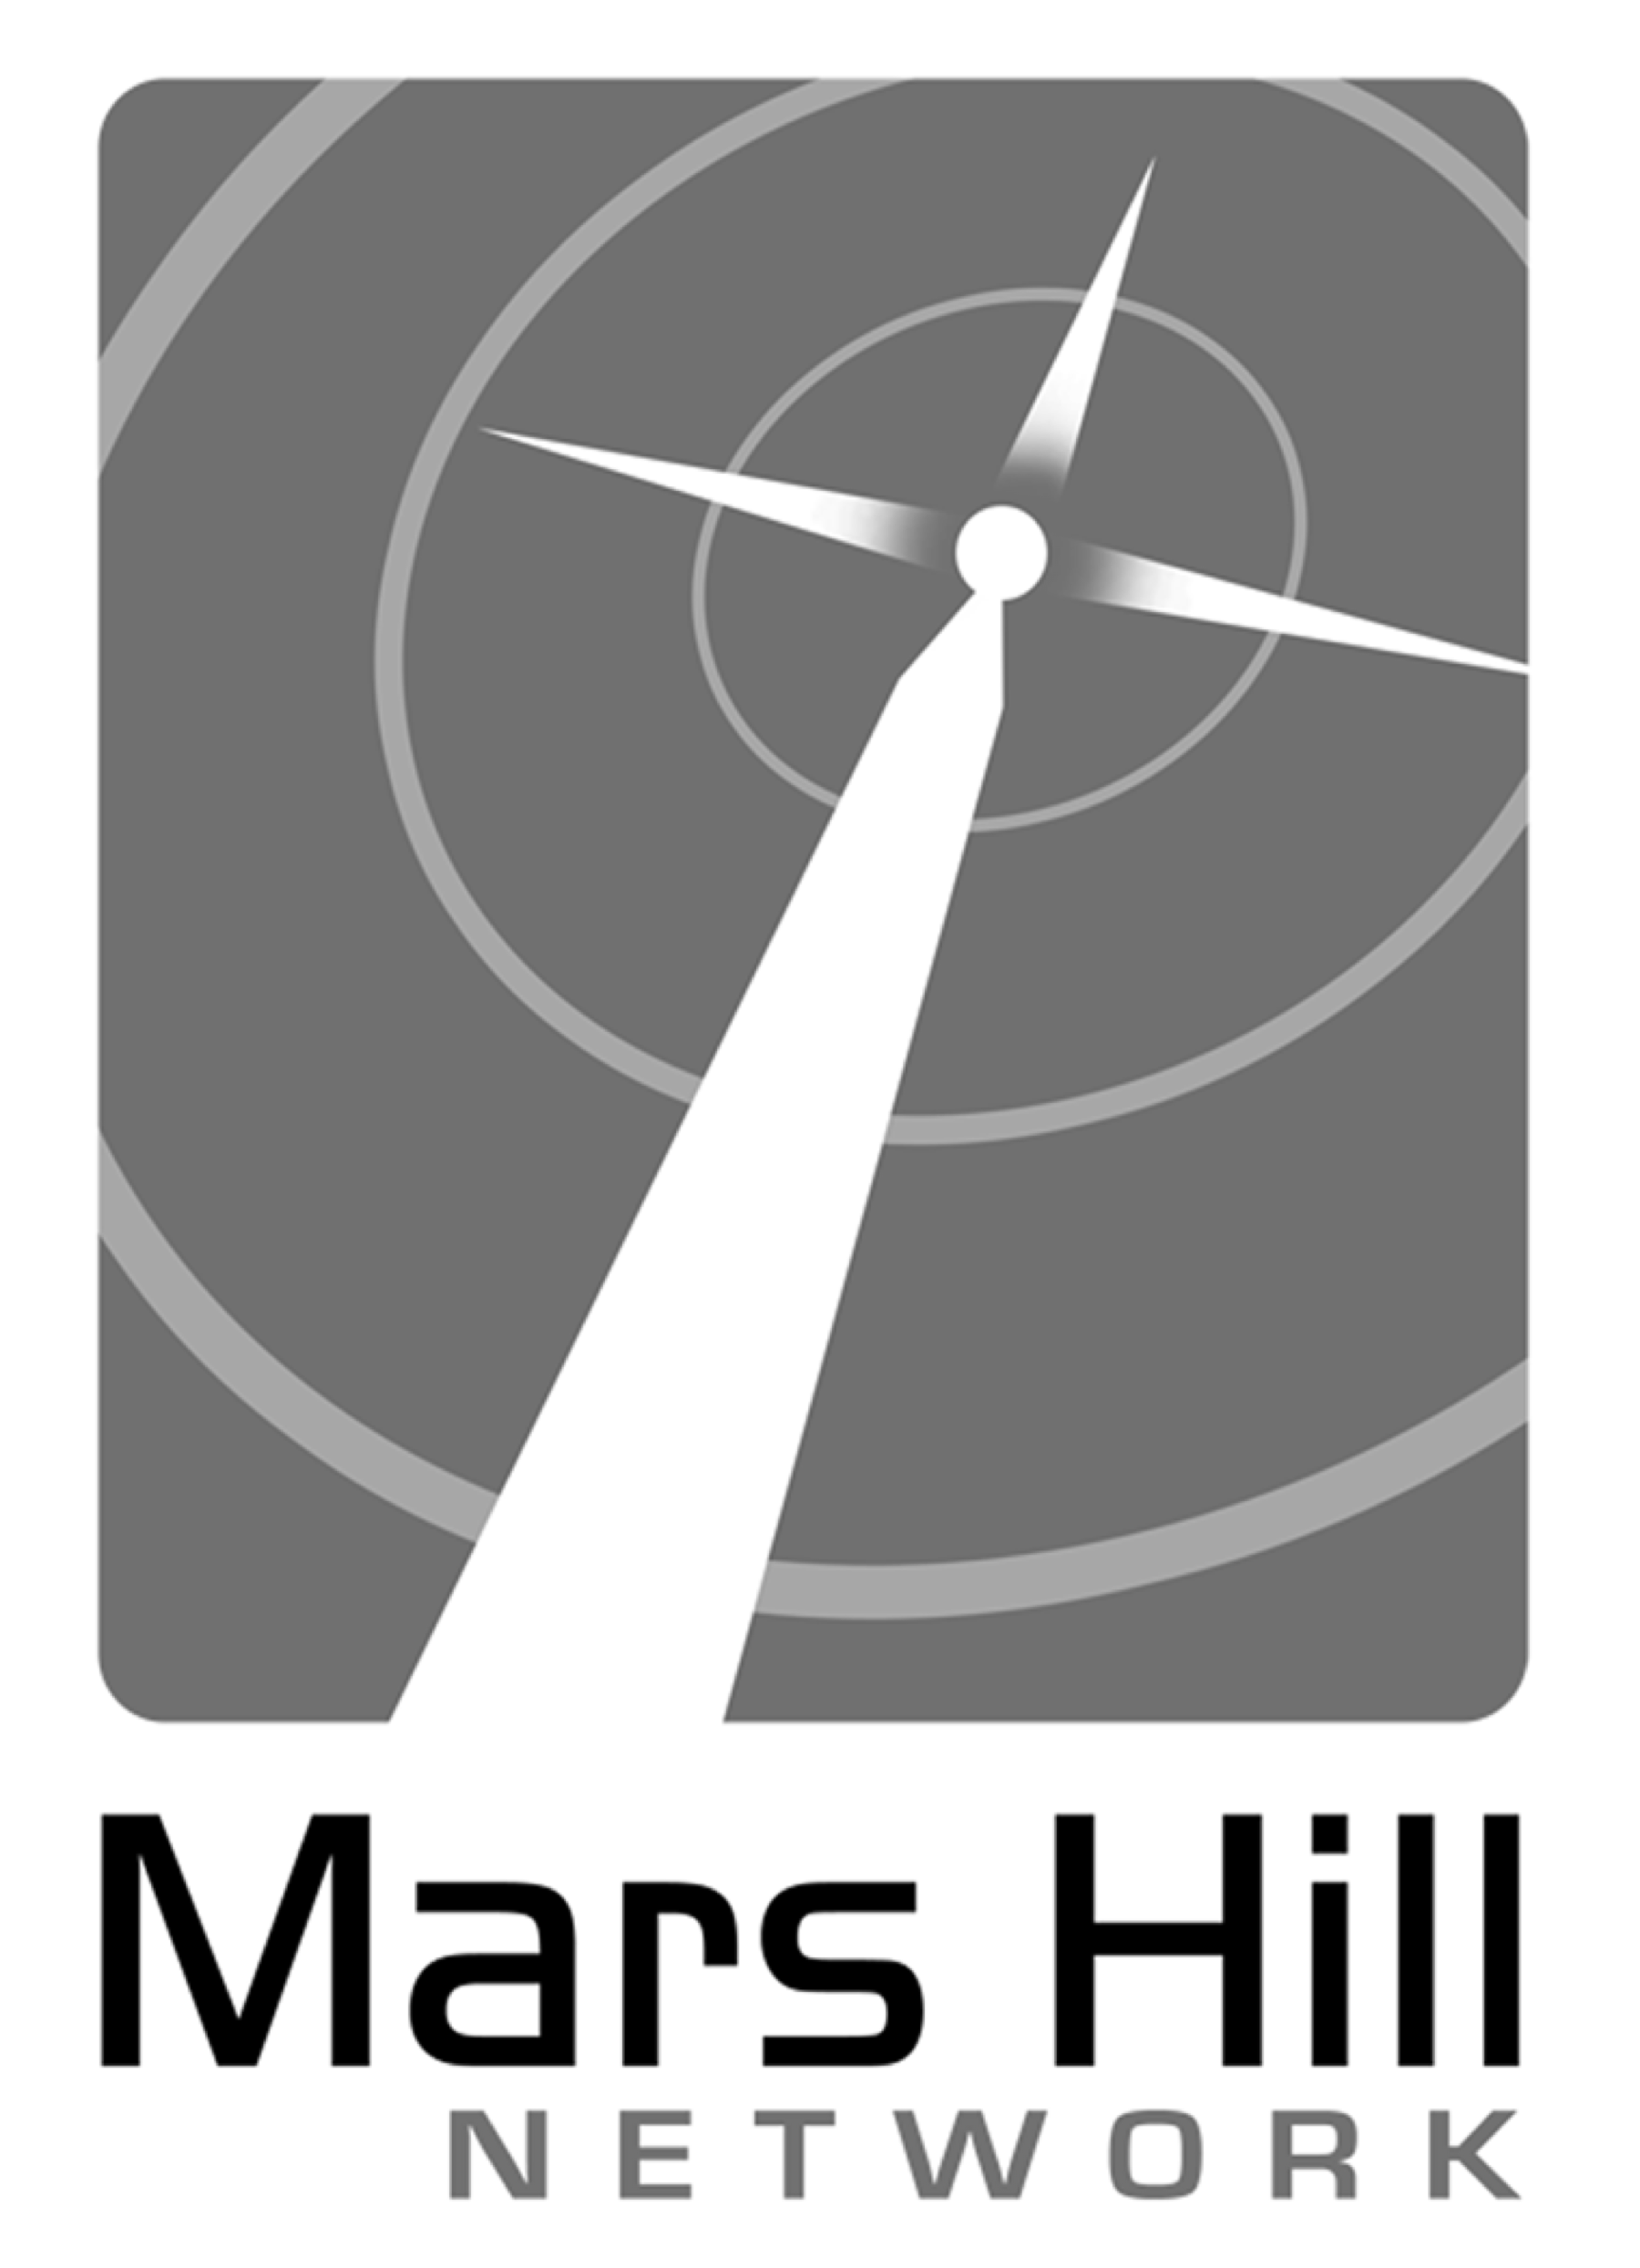 173 Mars Hill Network